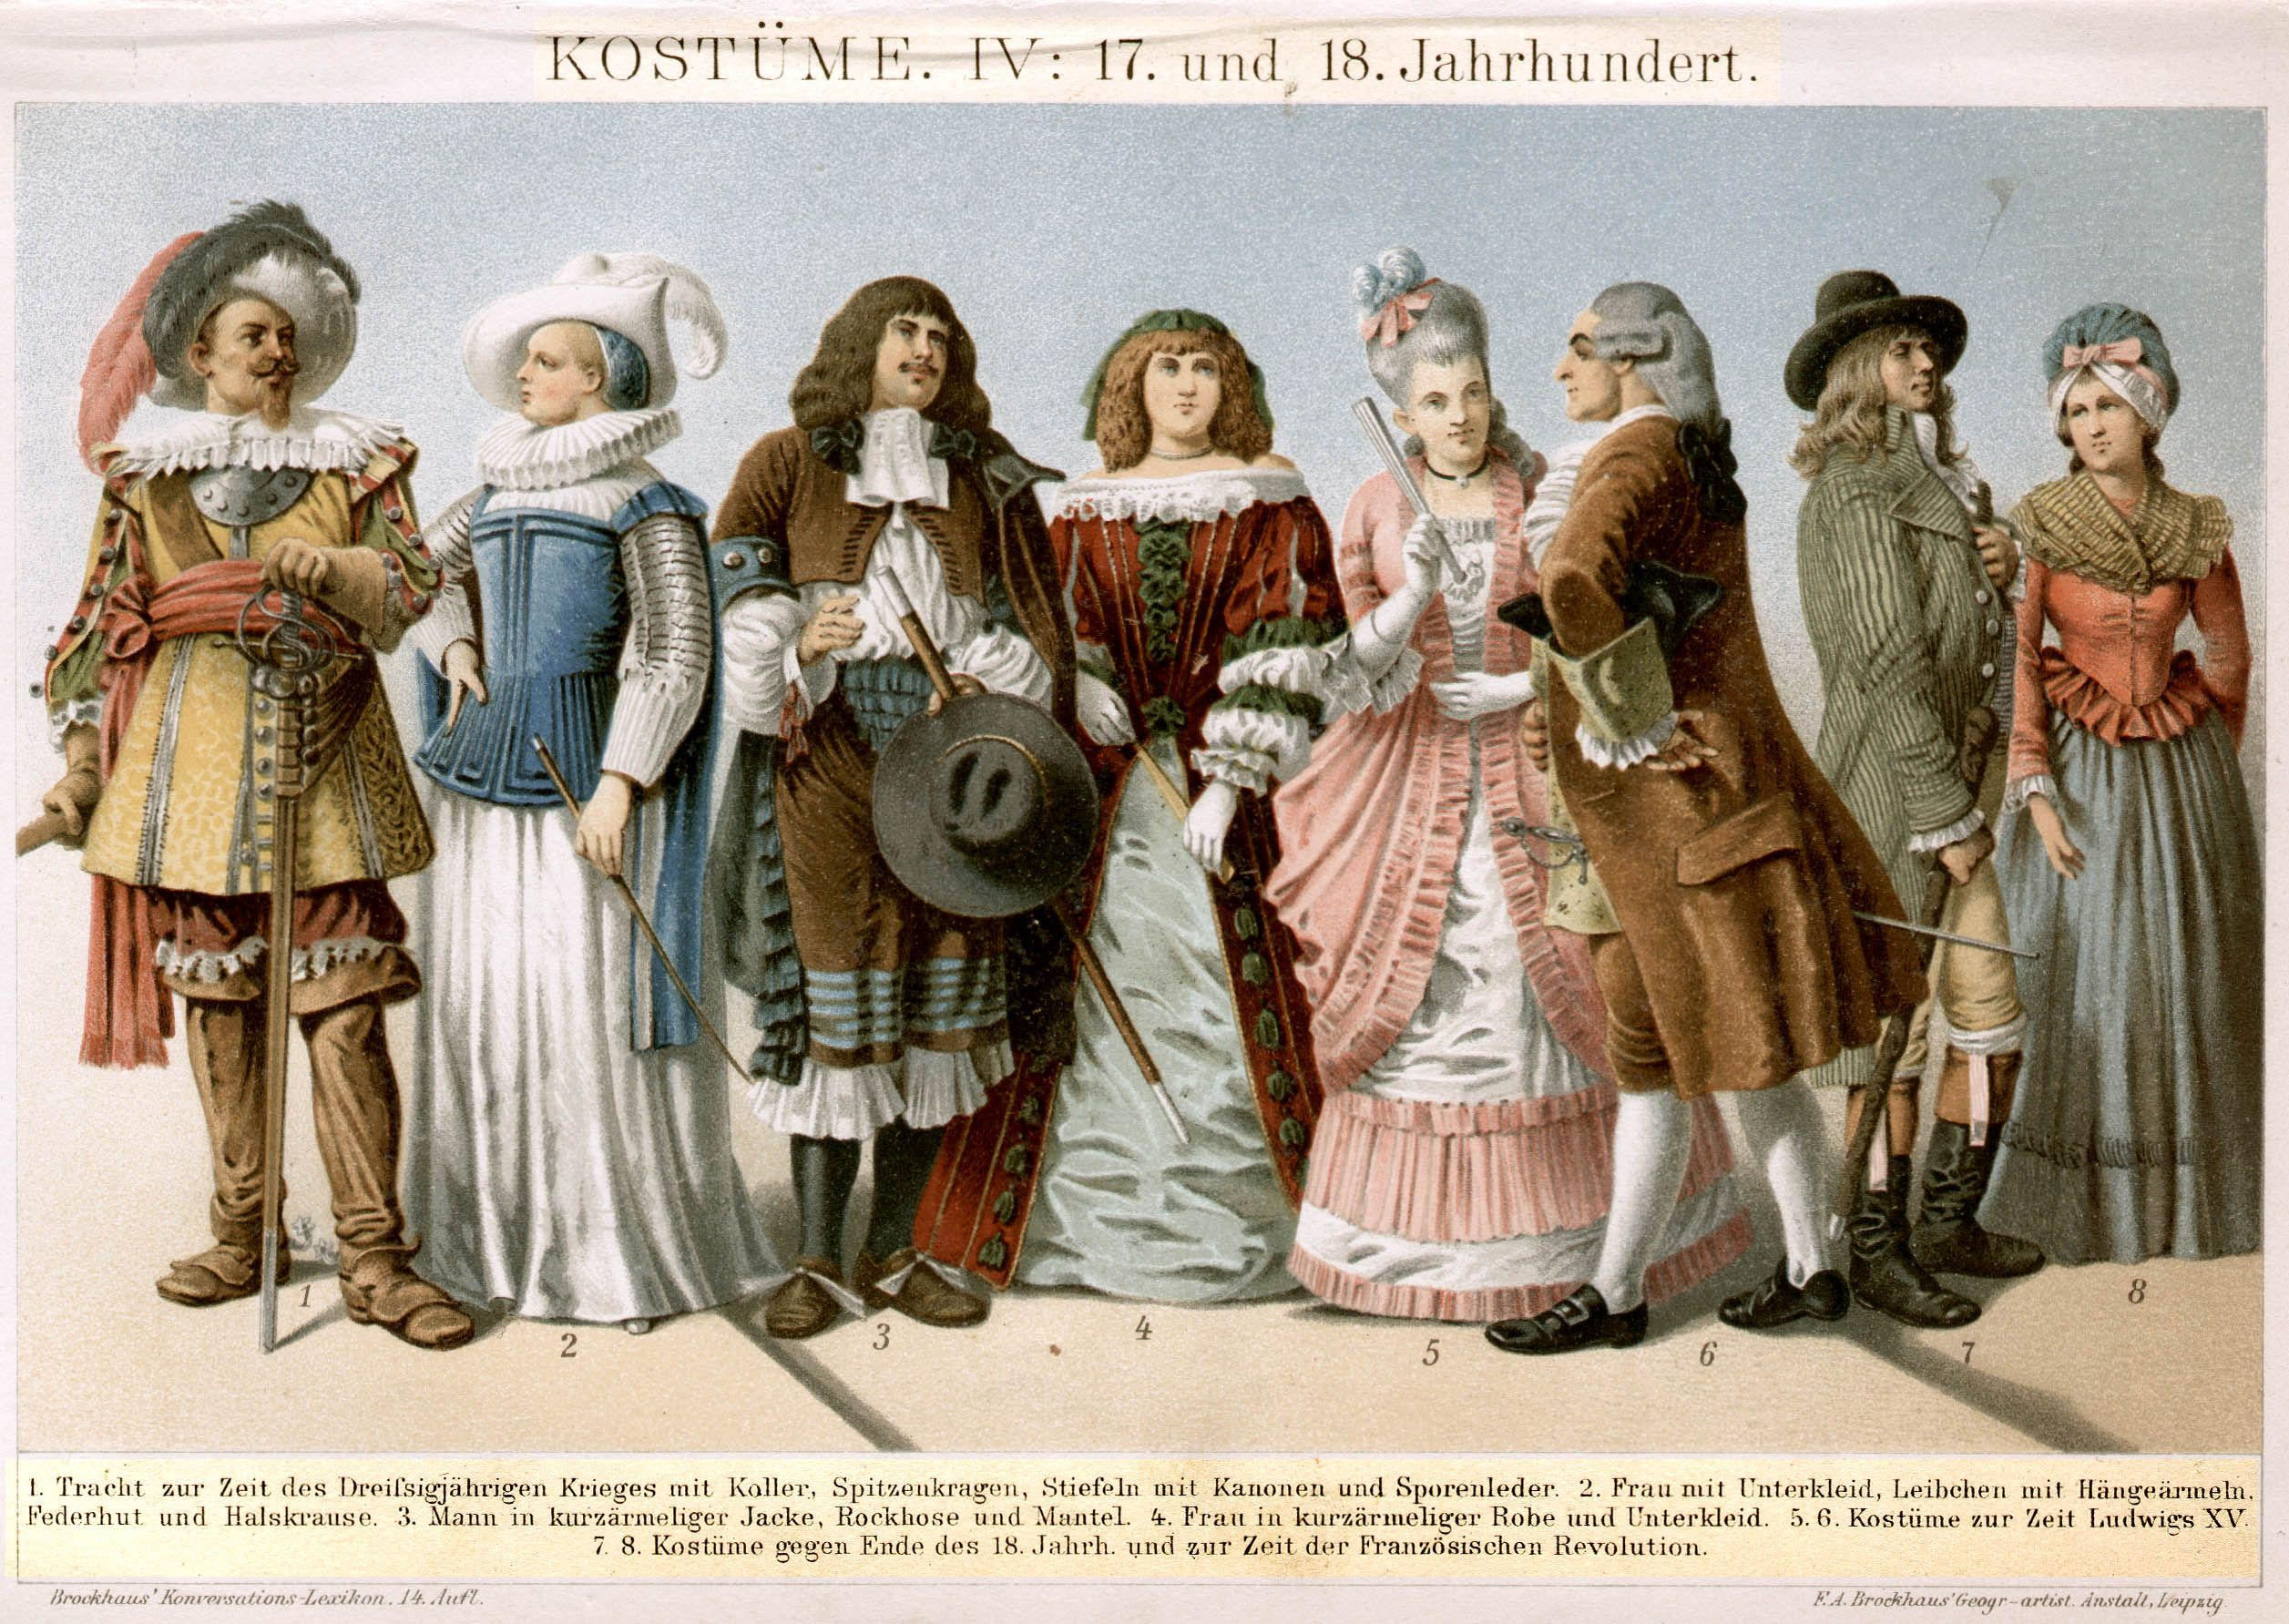 Tracht des 17. und 18. Jahrhunderts http://www.retrobibliothek.de/retrobib/hiresfaksimile_5181892.jpeg